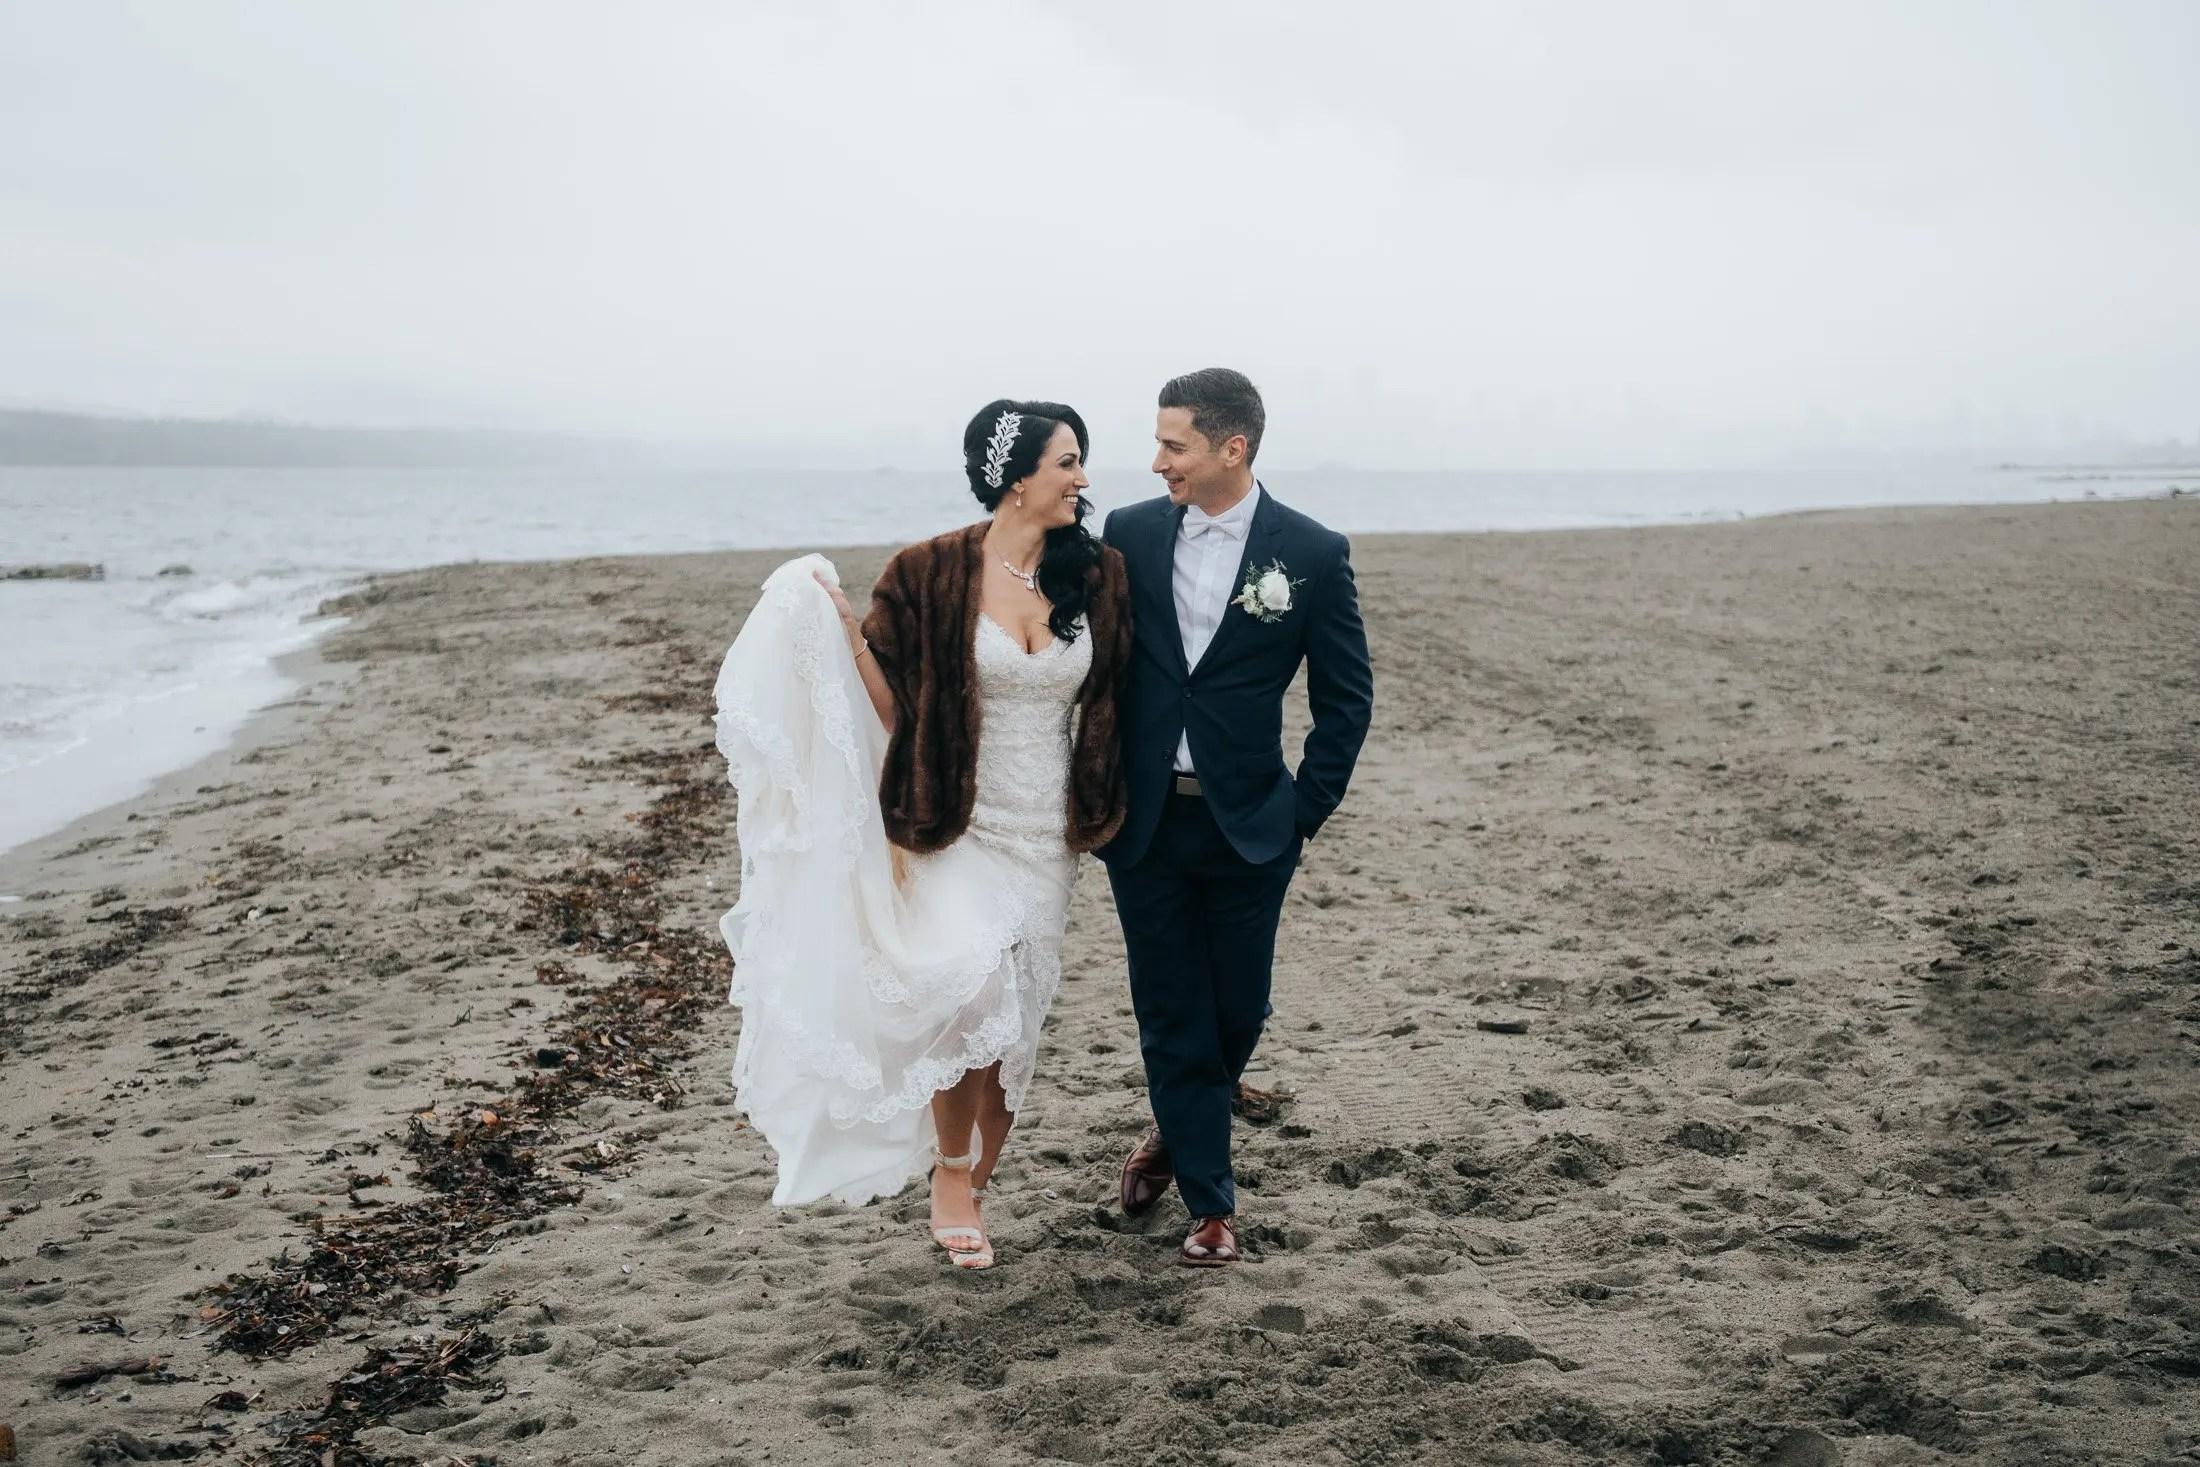 Best Spanish Banks Wedding Photoshoots Pursell Photography